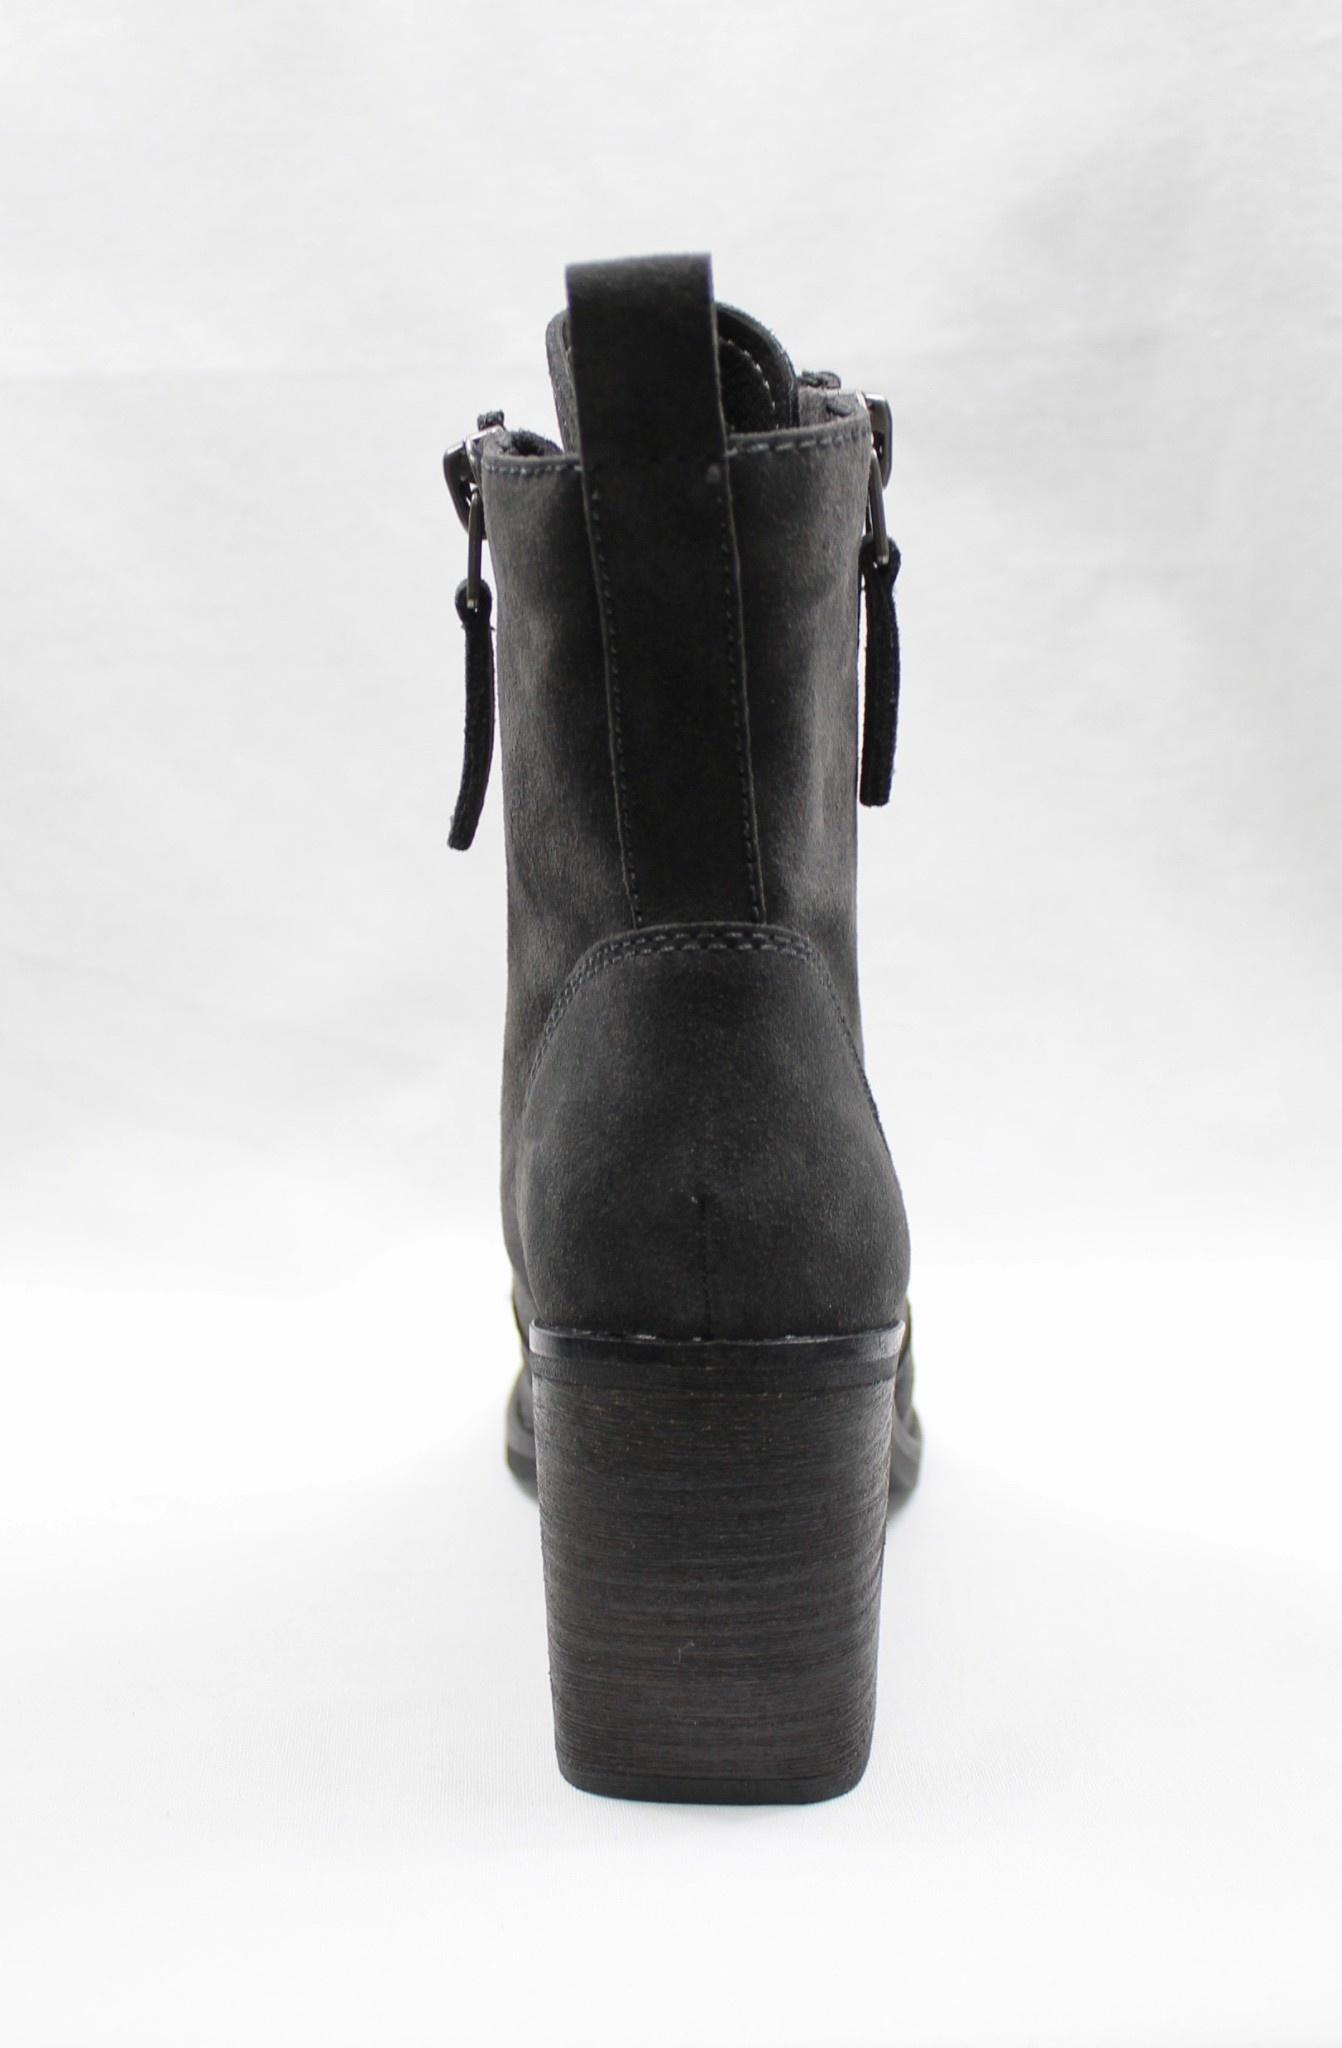 "DOLCE VITA DOLCE VITA ""LELA"" Lace-Up Boot Reg. $199 Sale $149"